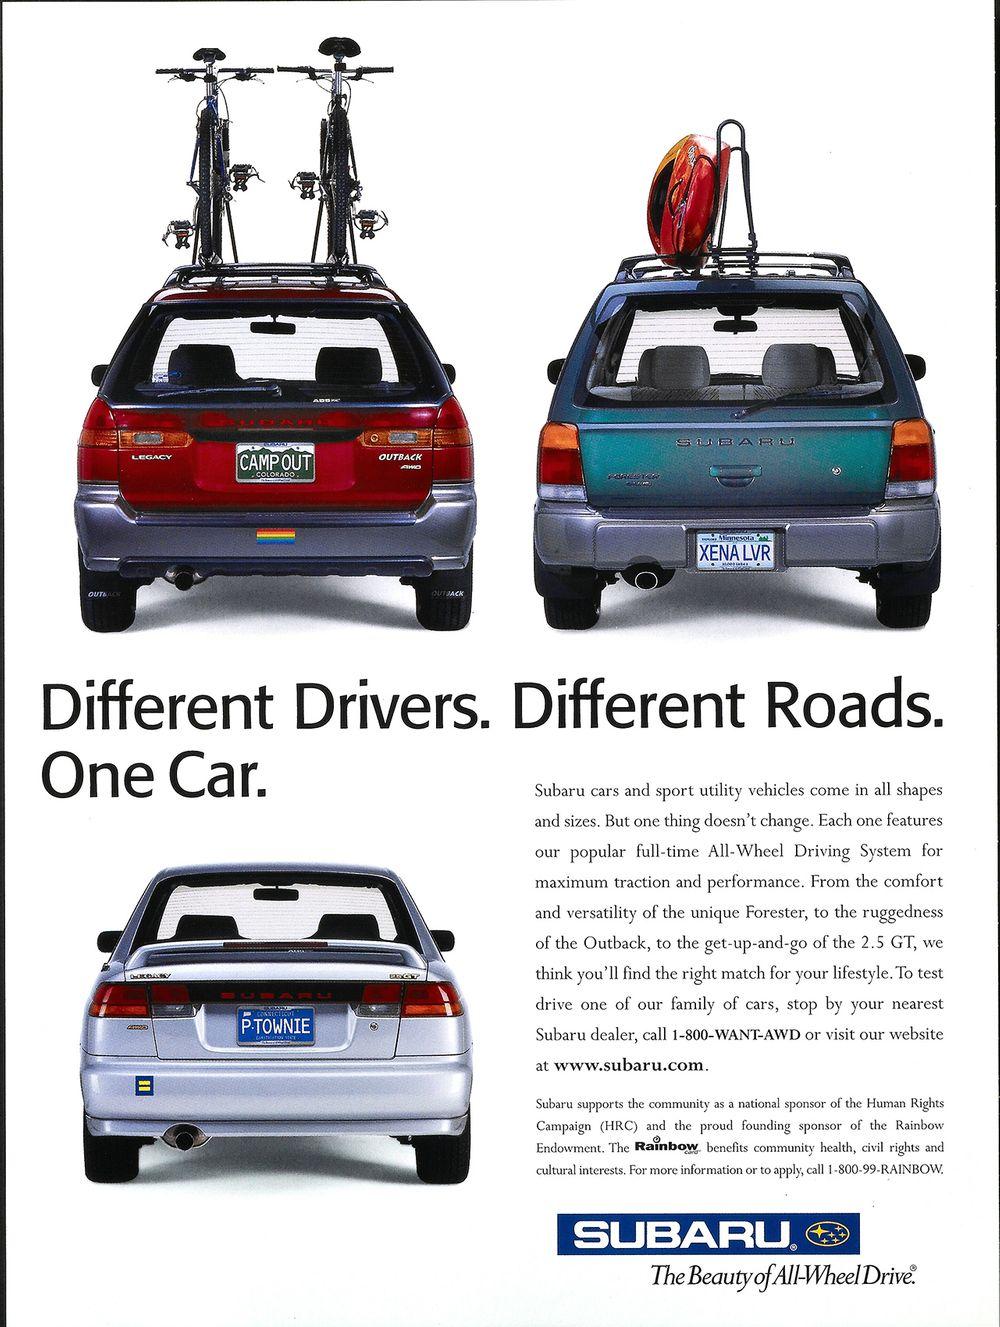 subaru-drivers.jpg